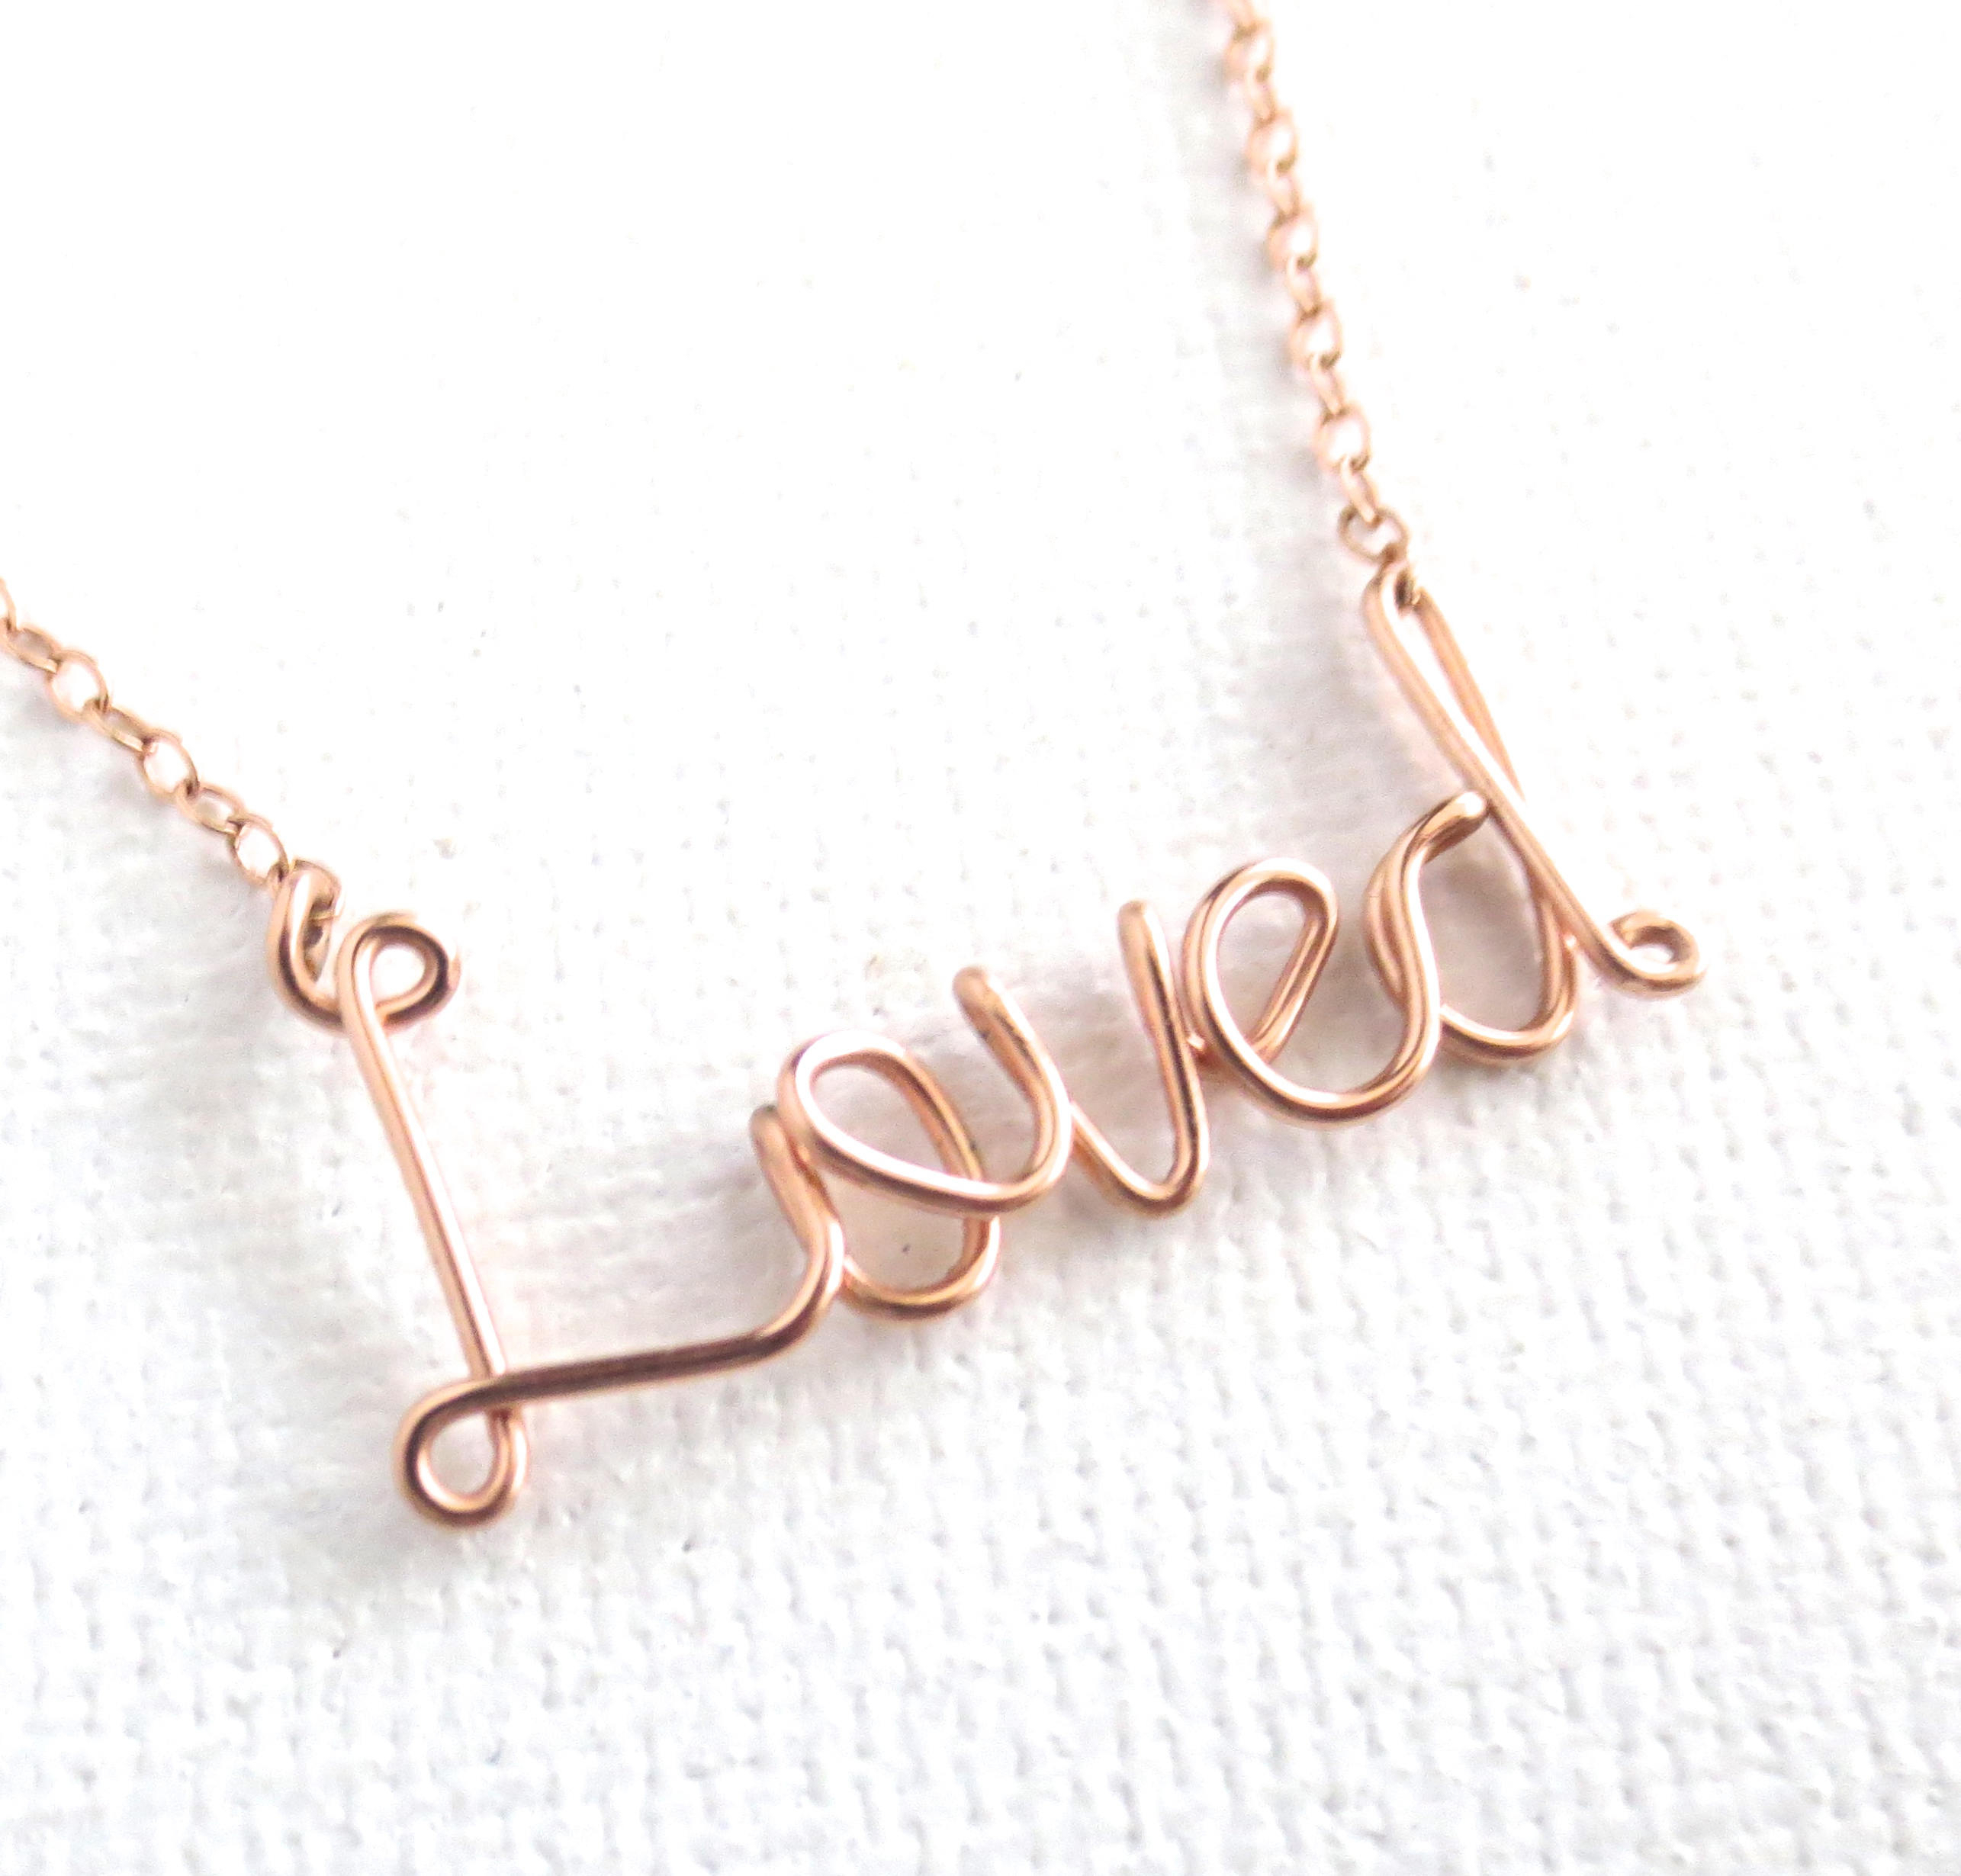 Rose Gold Loved Necklace. 14K Rose Gold Filled Love Necklace. Pink Gold Filled Love Script Wire Necklace (View 23 of 25)